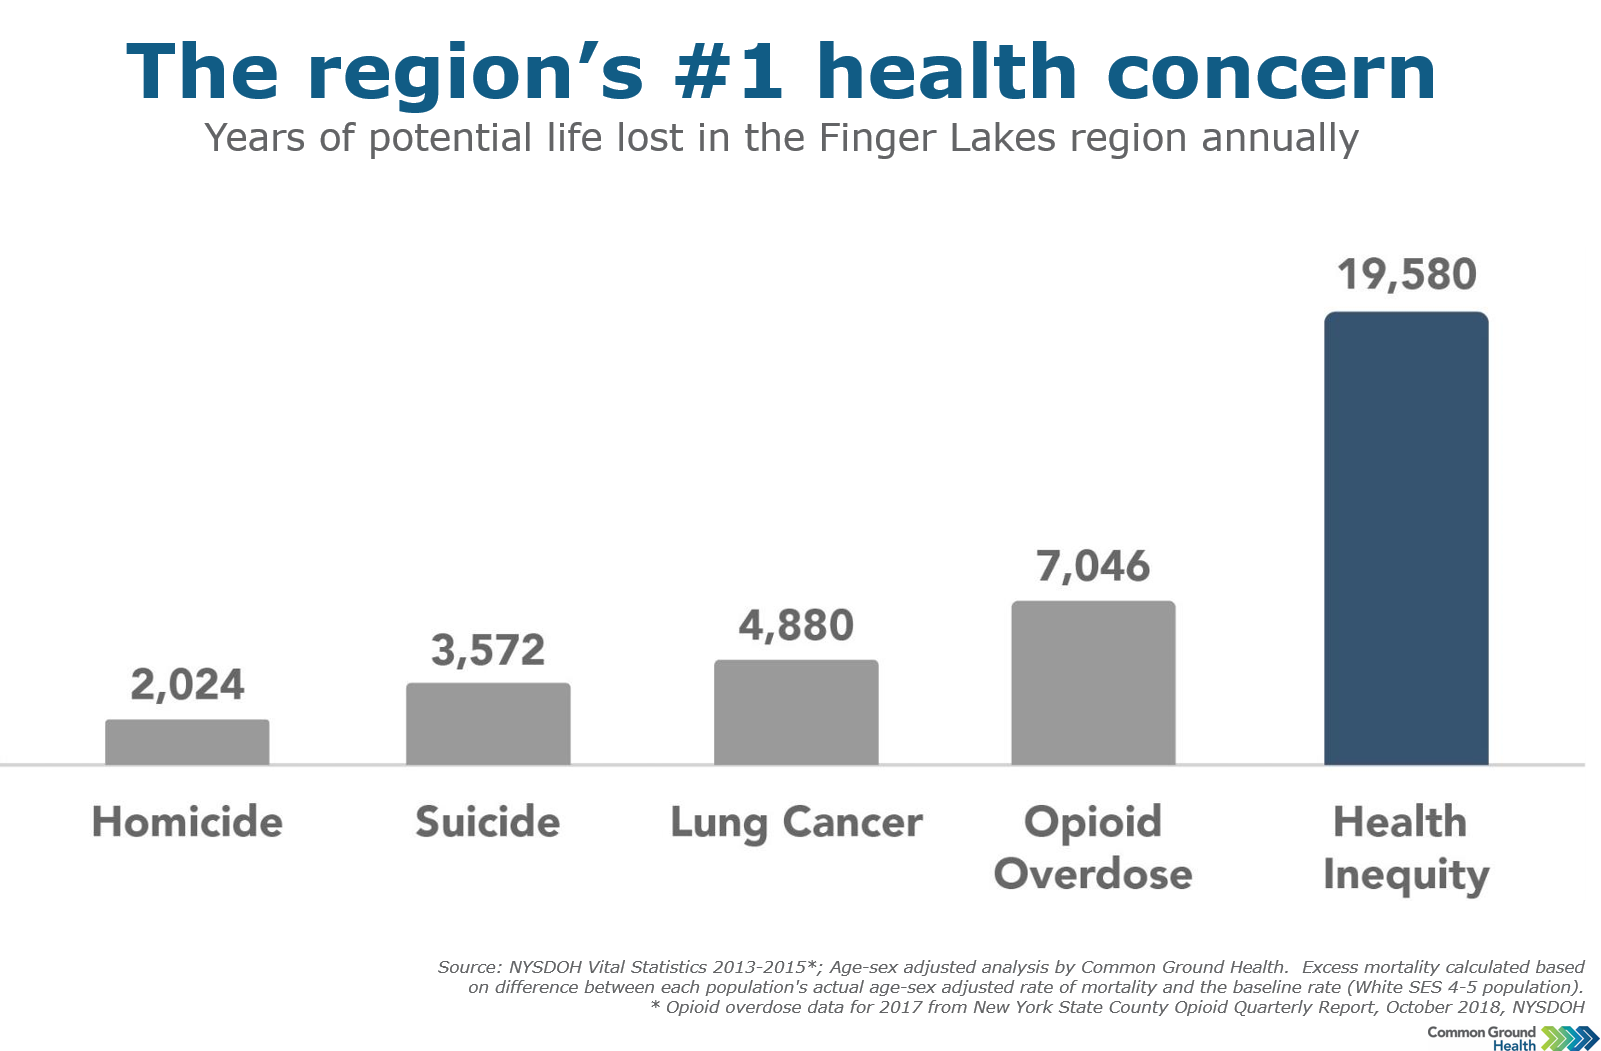 Health Inequity Causes Premature Death